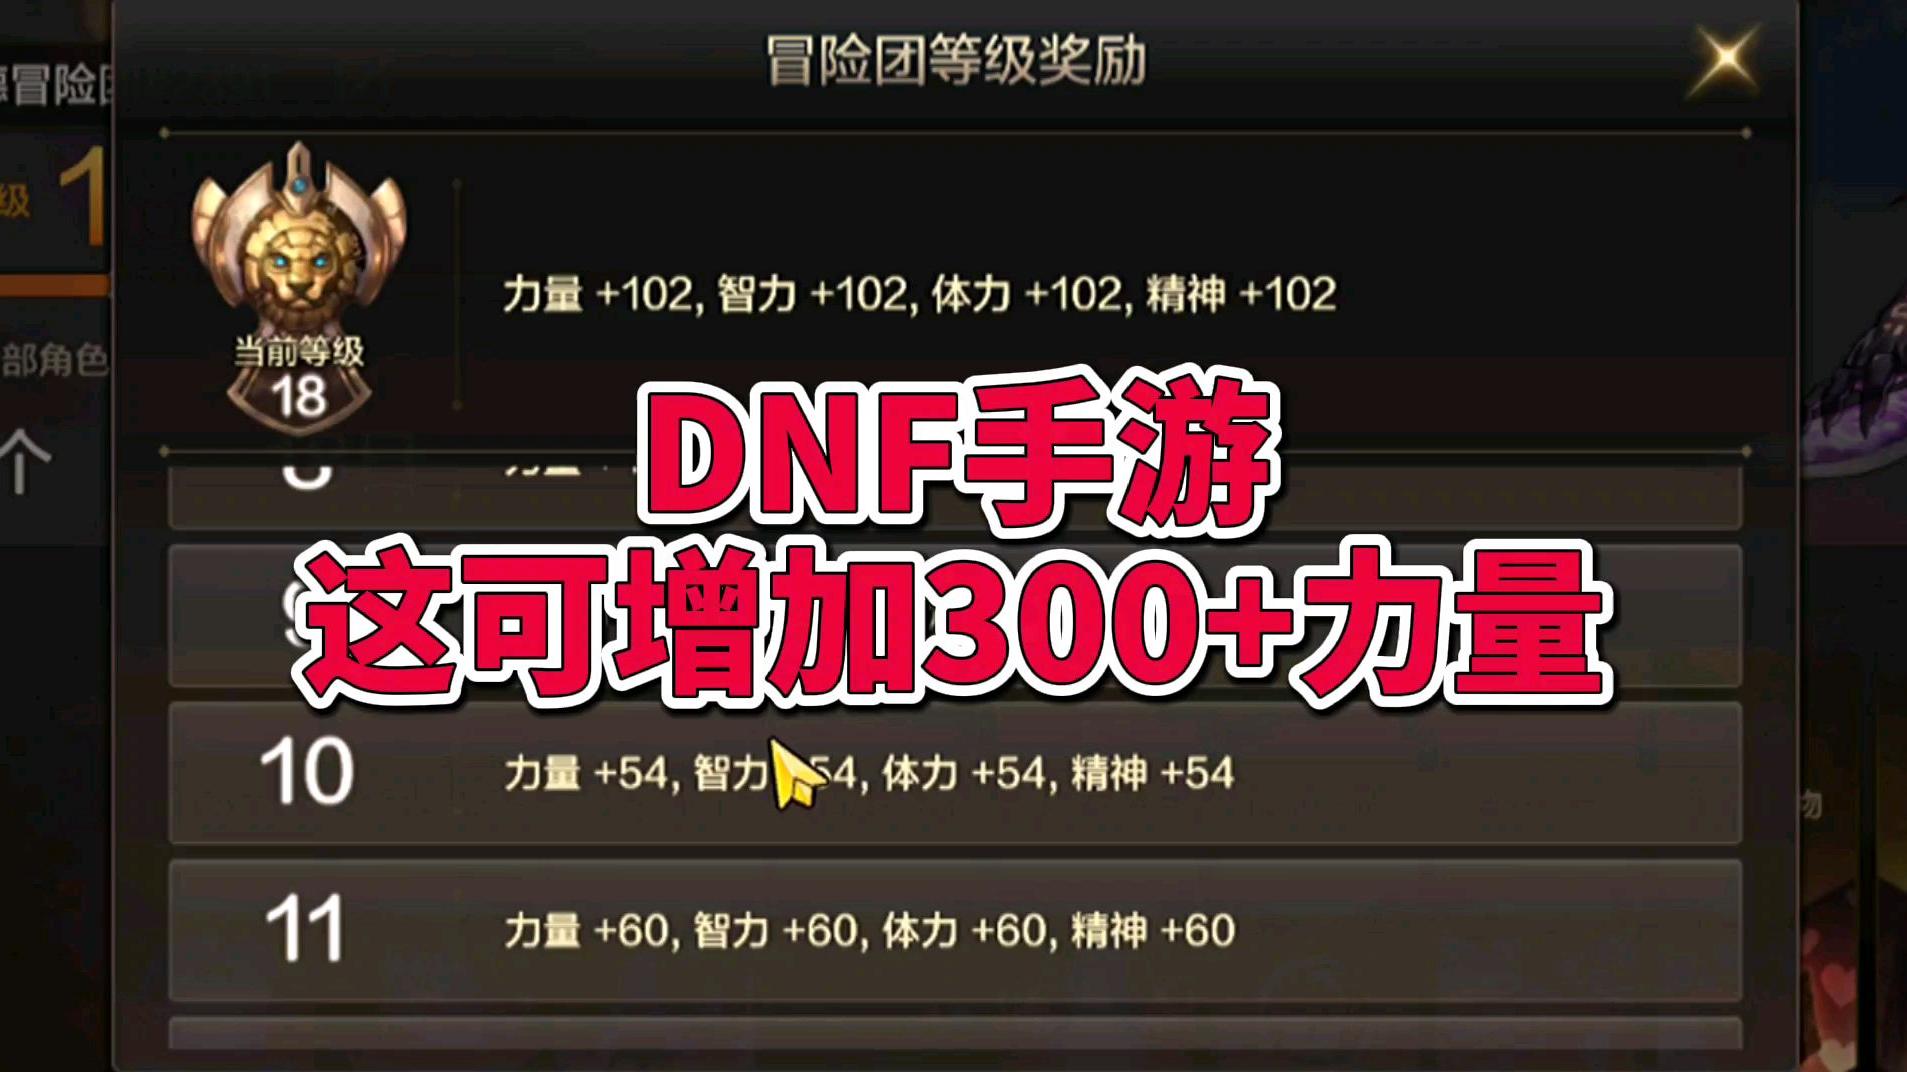 DNF手游:冒险团系统太强了,搬砖党的春天来了。